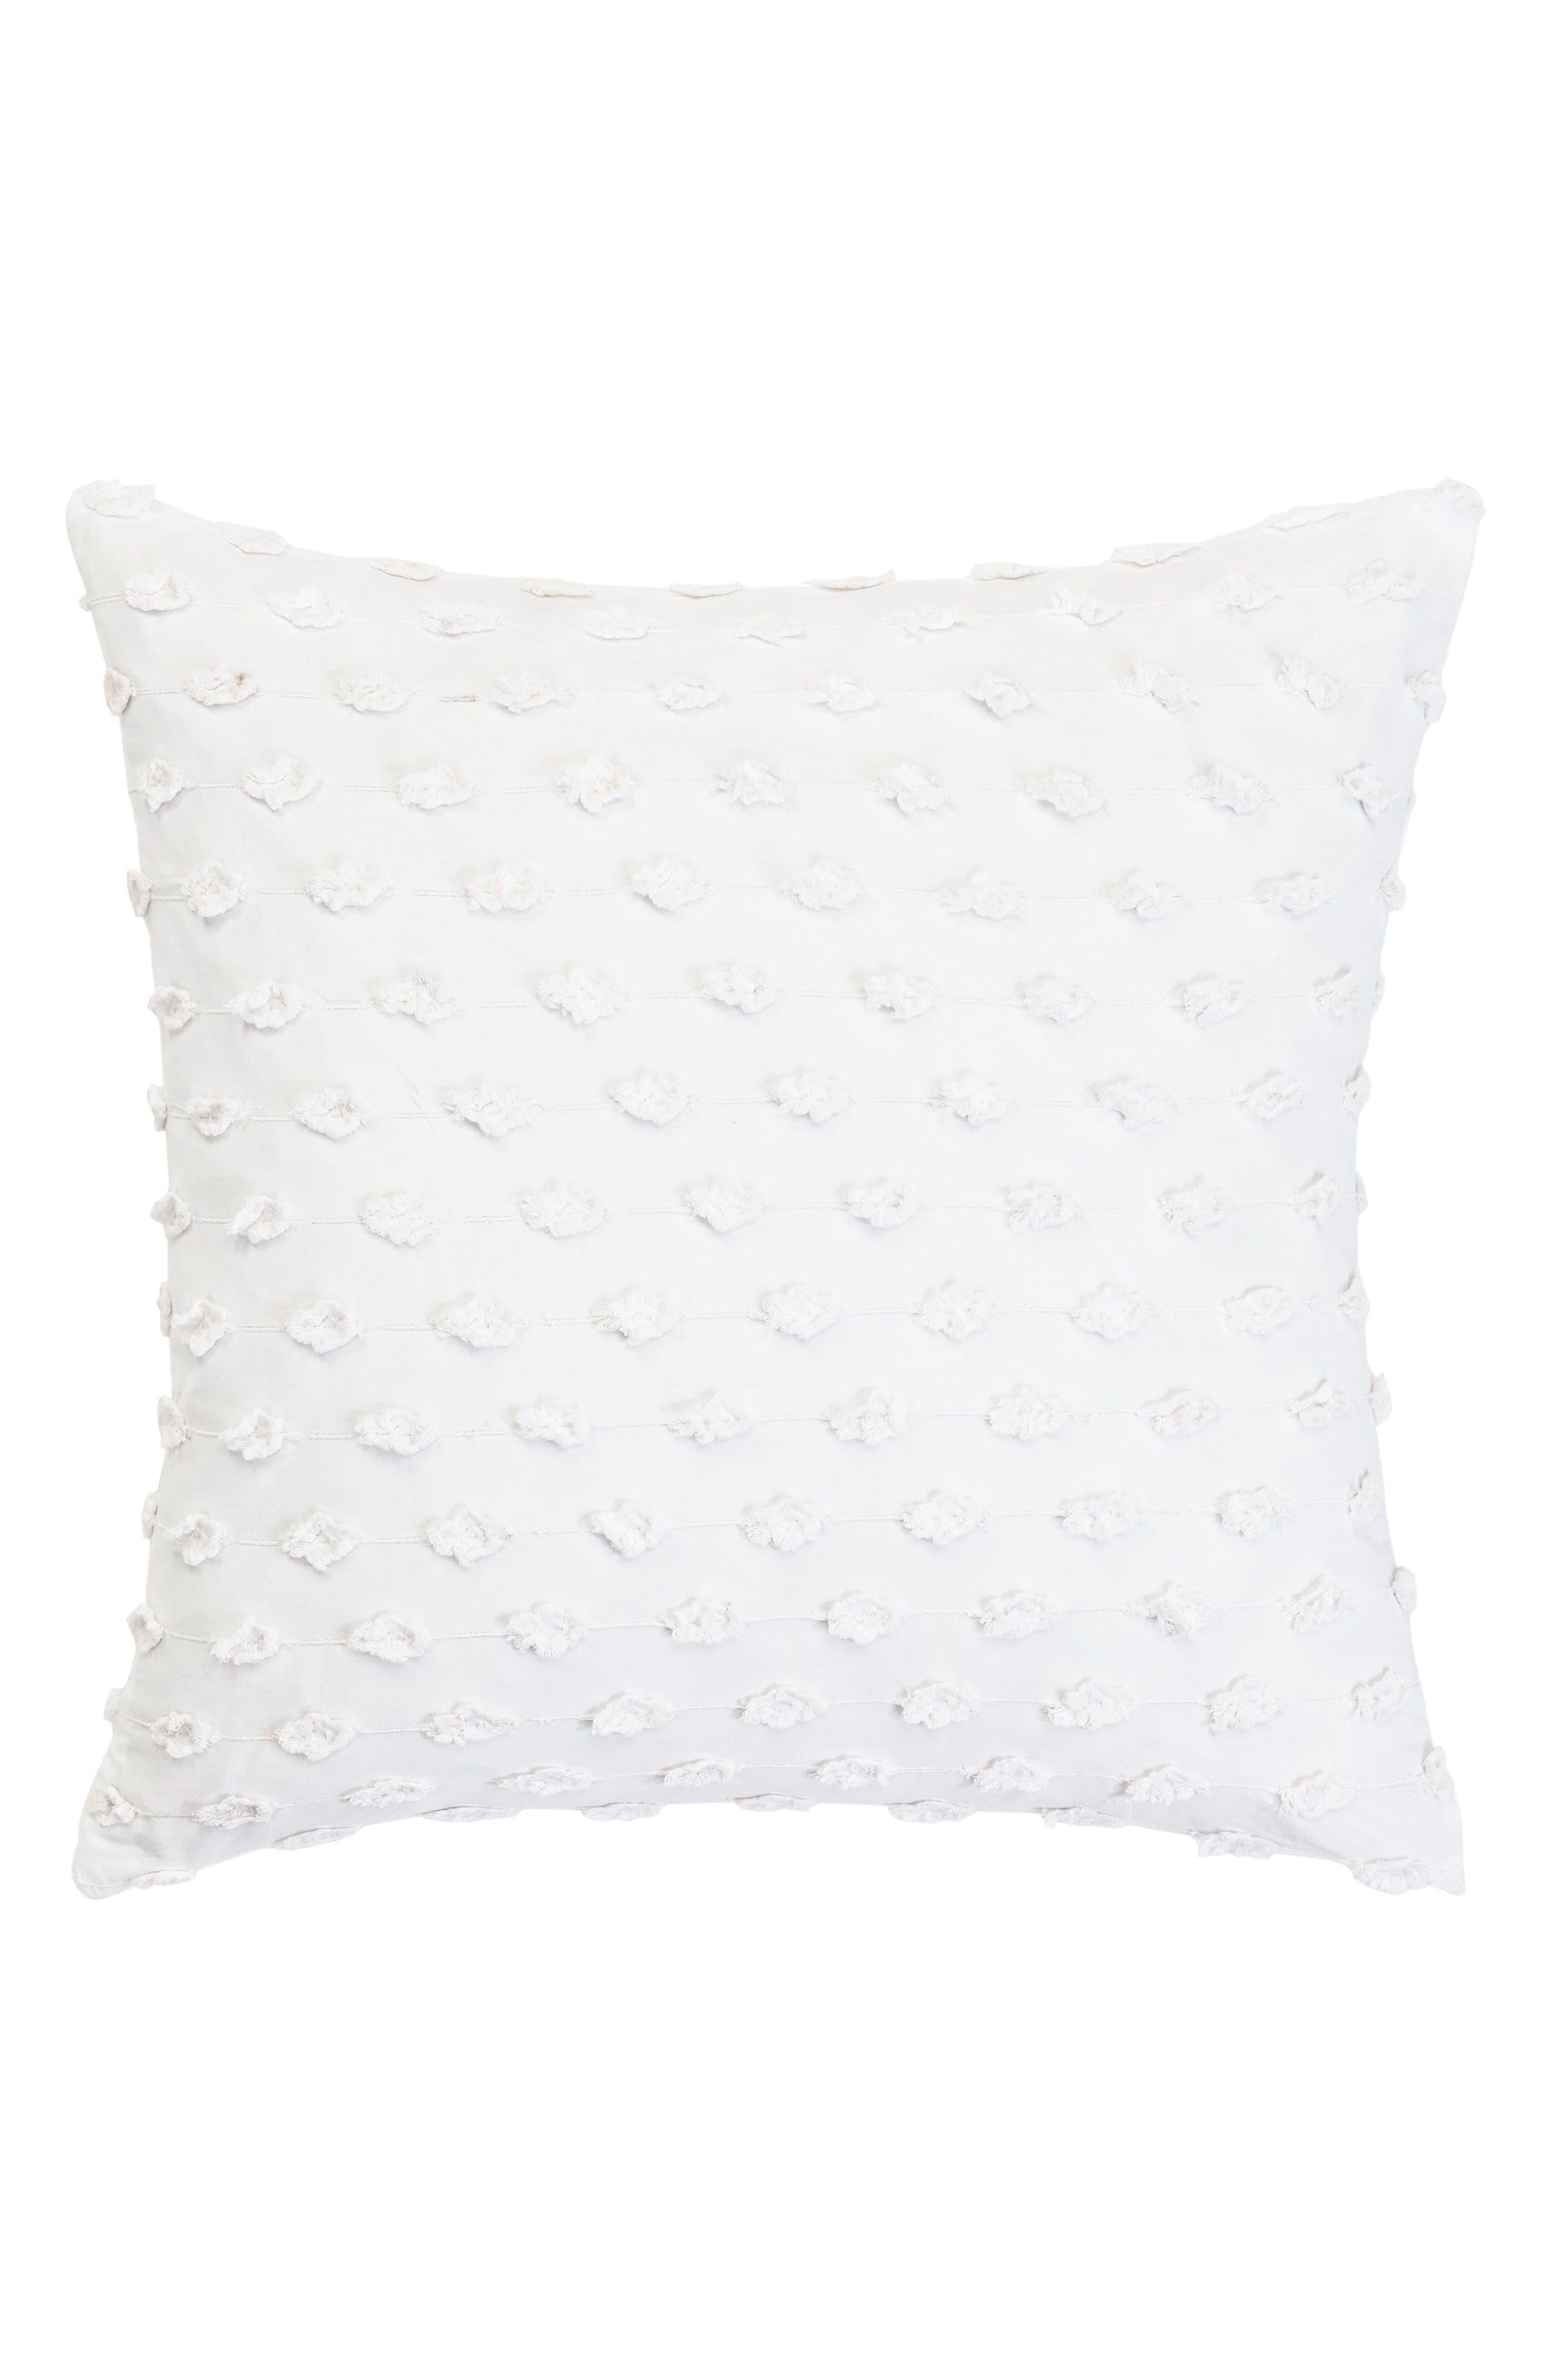 Fringe Accent Pillow,                             Main thumbnail 1, color,                             WHITE